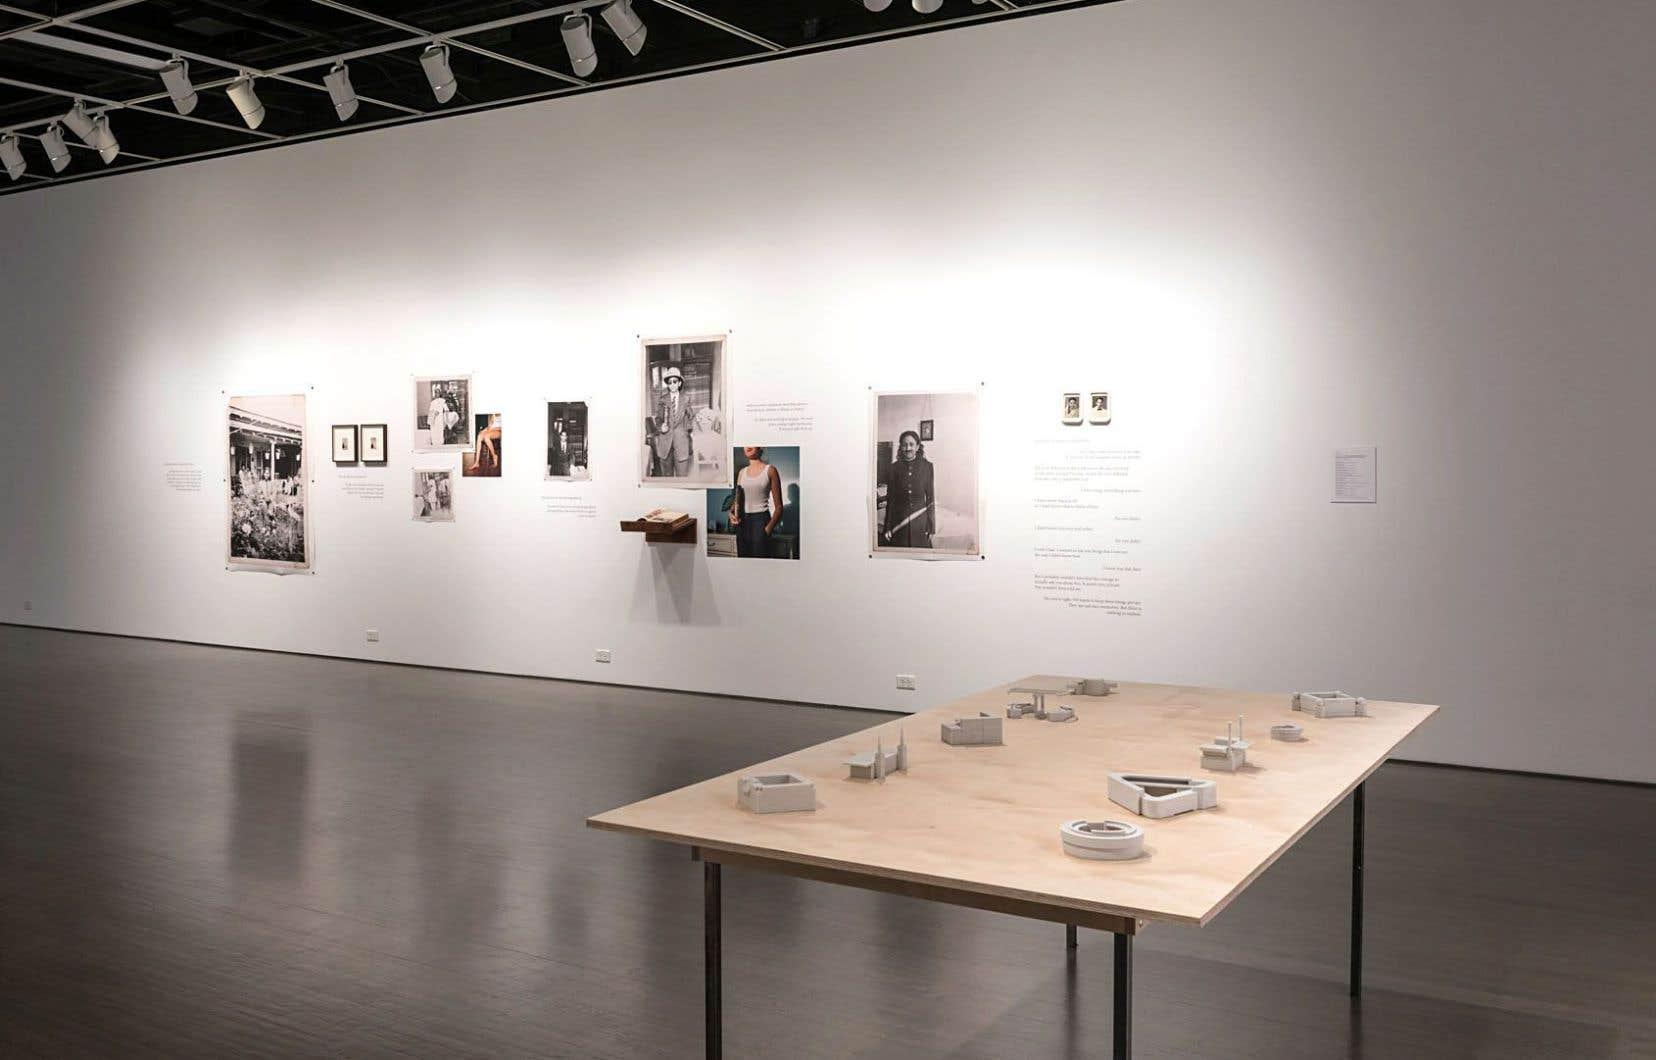 Vue de l'exposition «Ignition 13». Avec des œuvres de Zinnia Naqvi et de Brett Barmby.